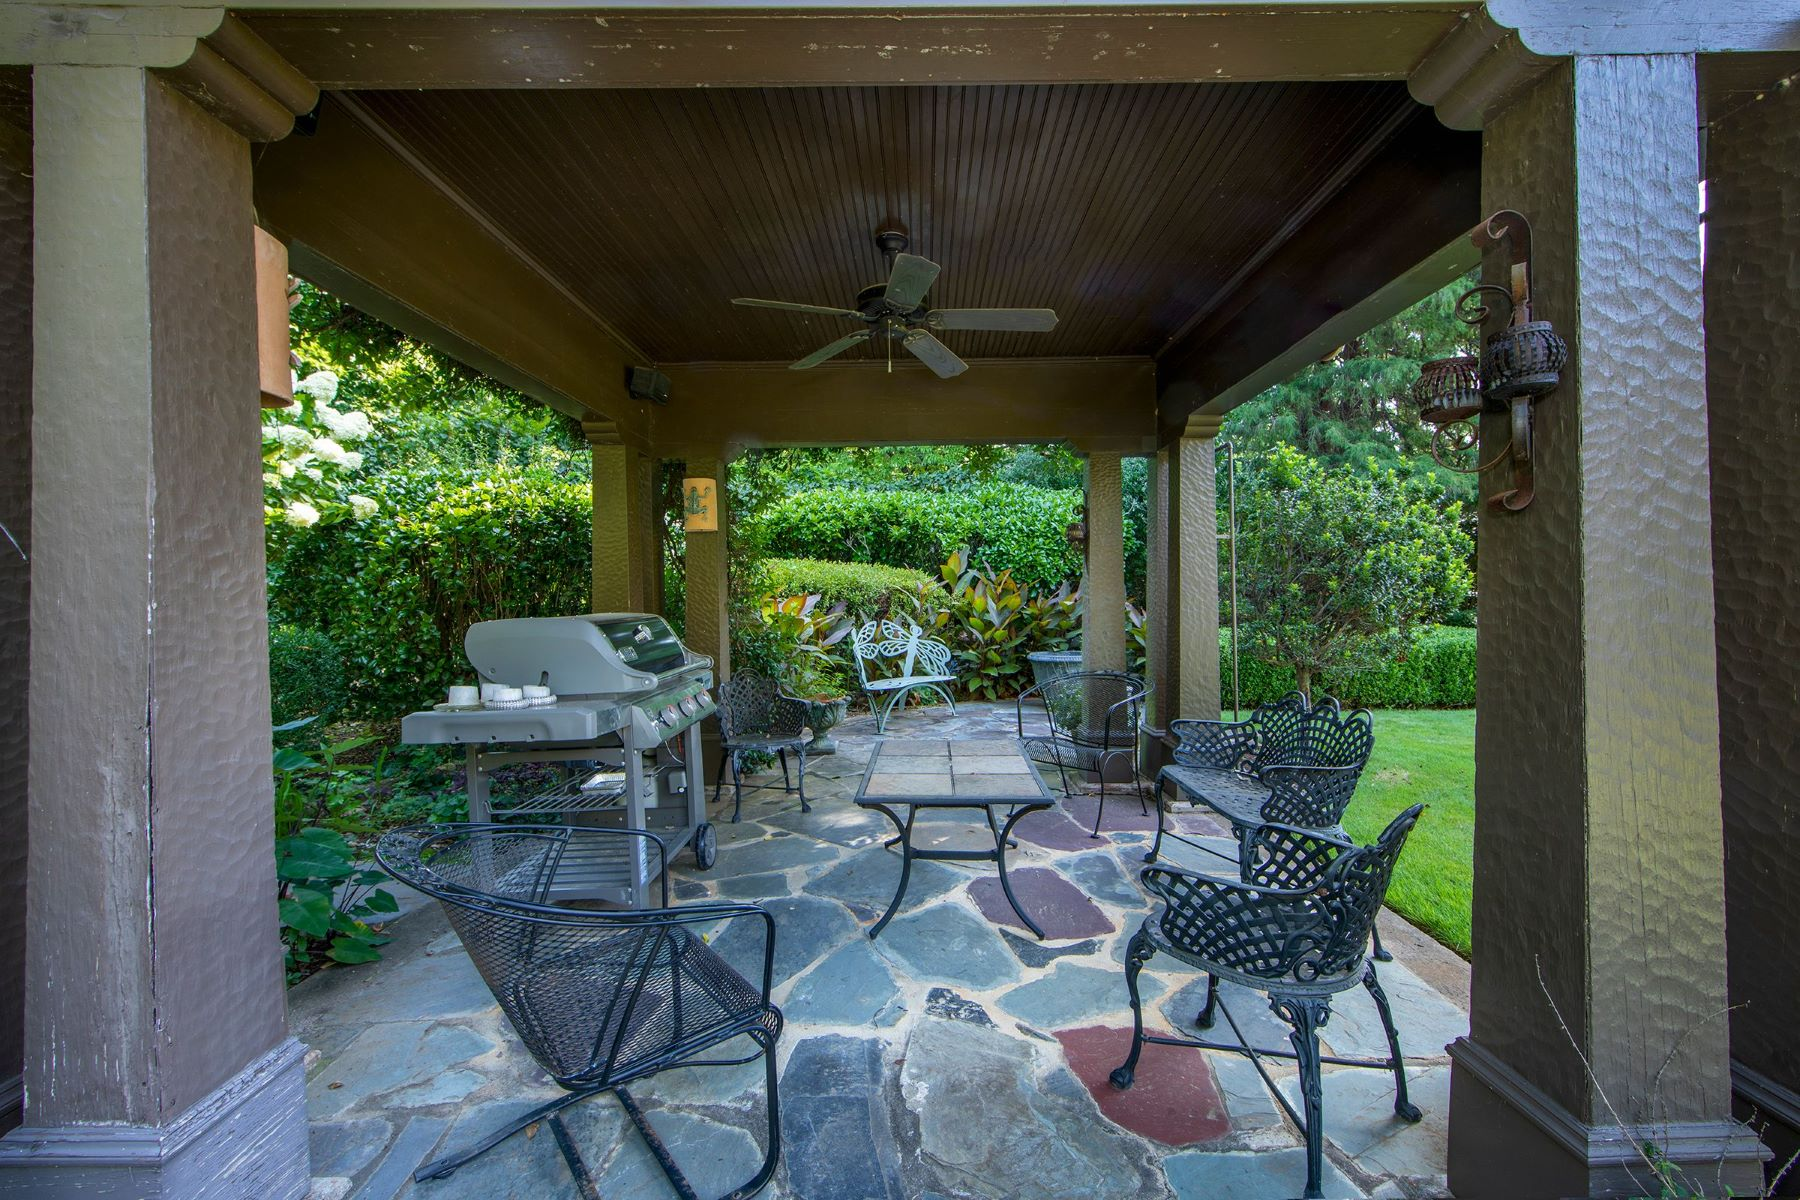 Single Family Homes for Active at 514 Otis, Spartanburg, Sc, 29302 514 Otis Spartanburg, South Carolina 29302 United States